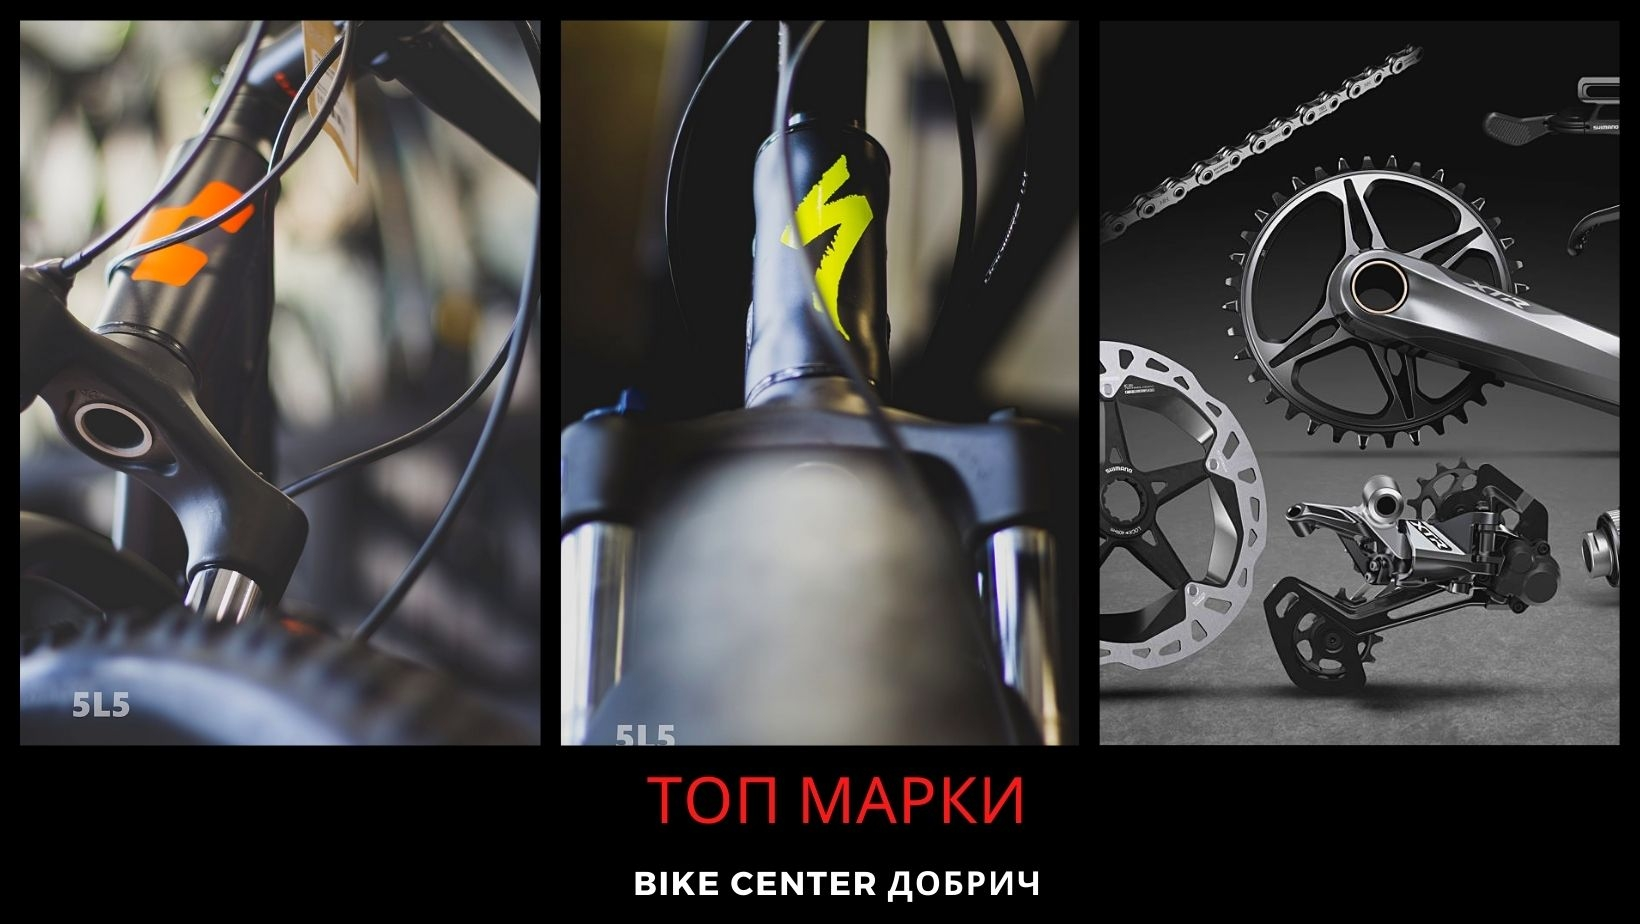 Магазин и сервиз Bike Center Добрич